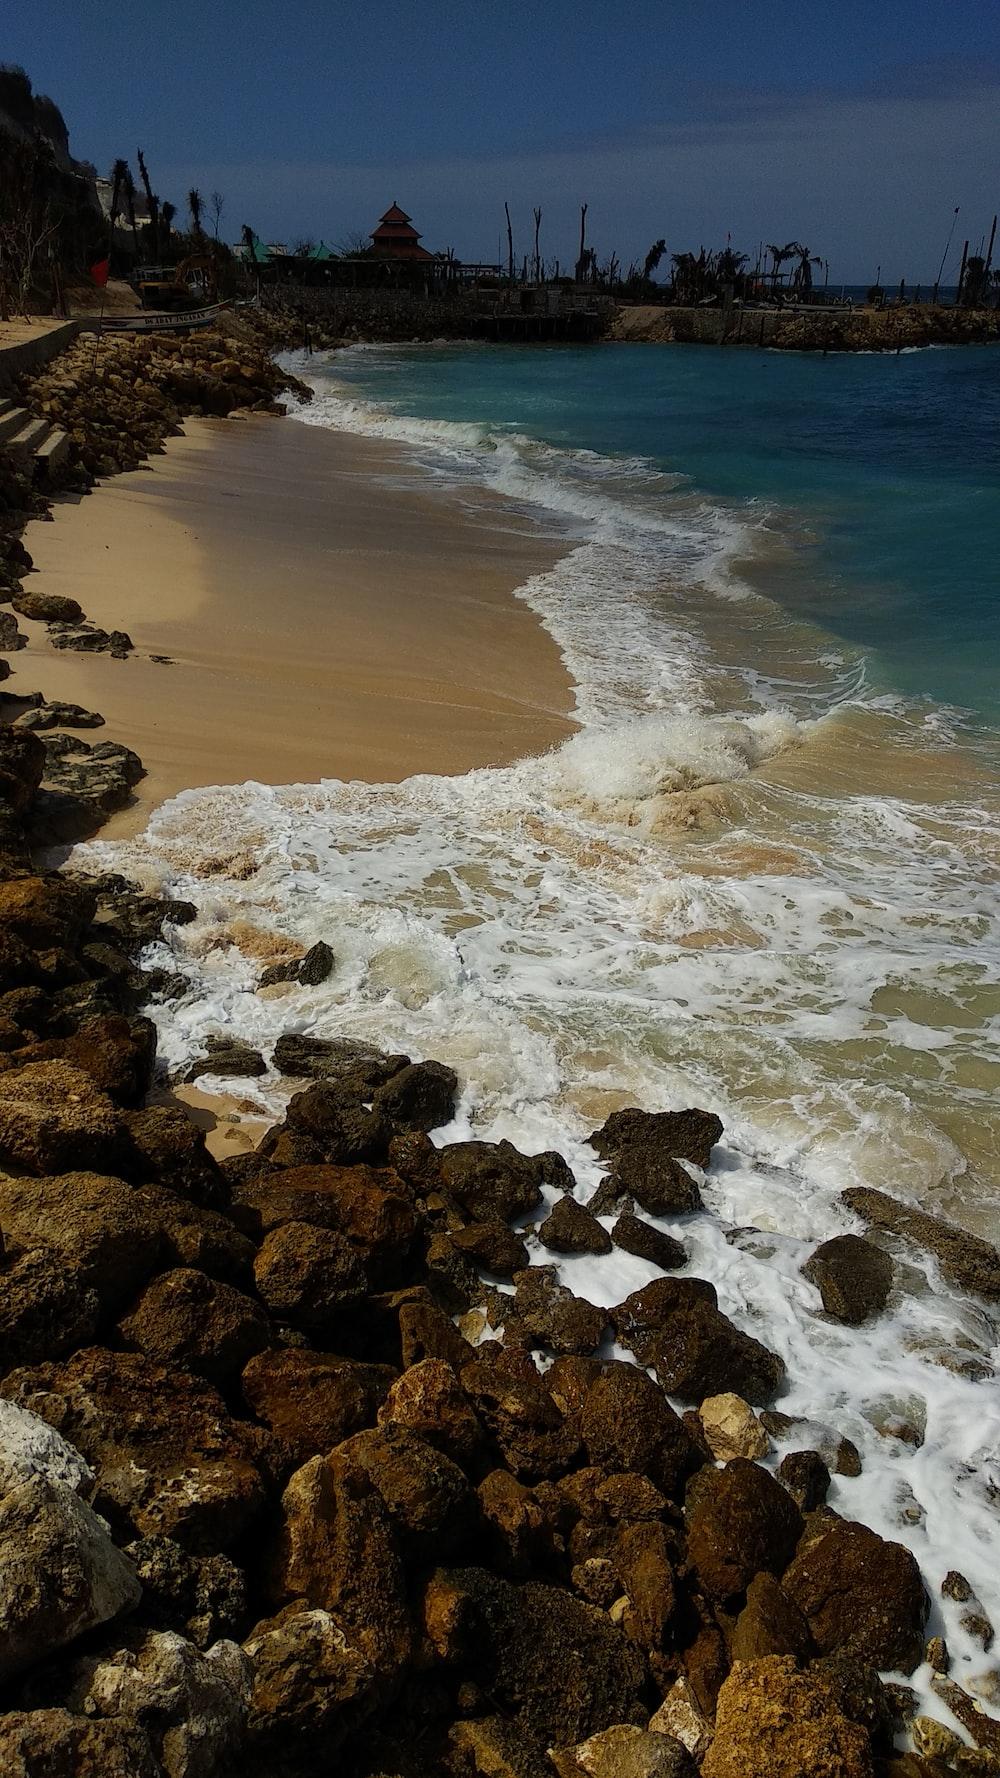 rocks beside body of water at daytime